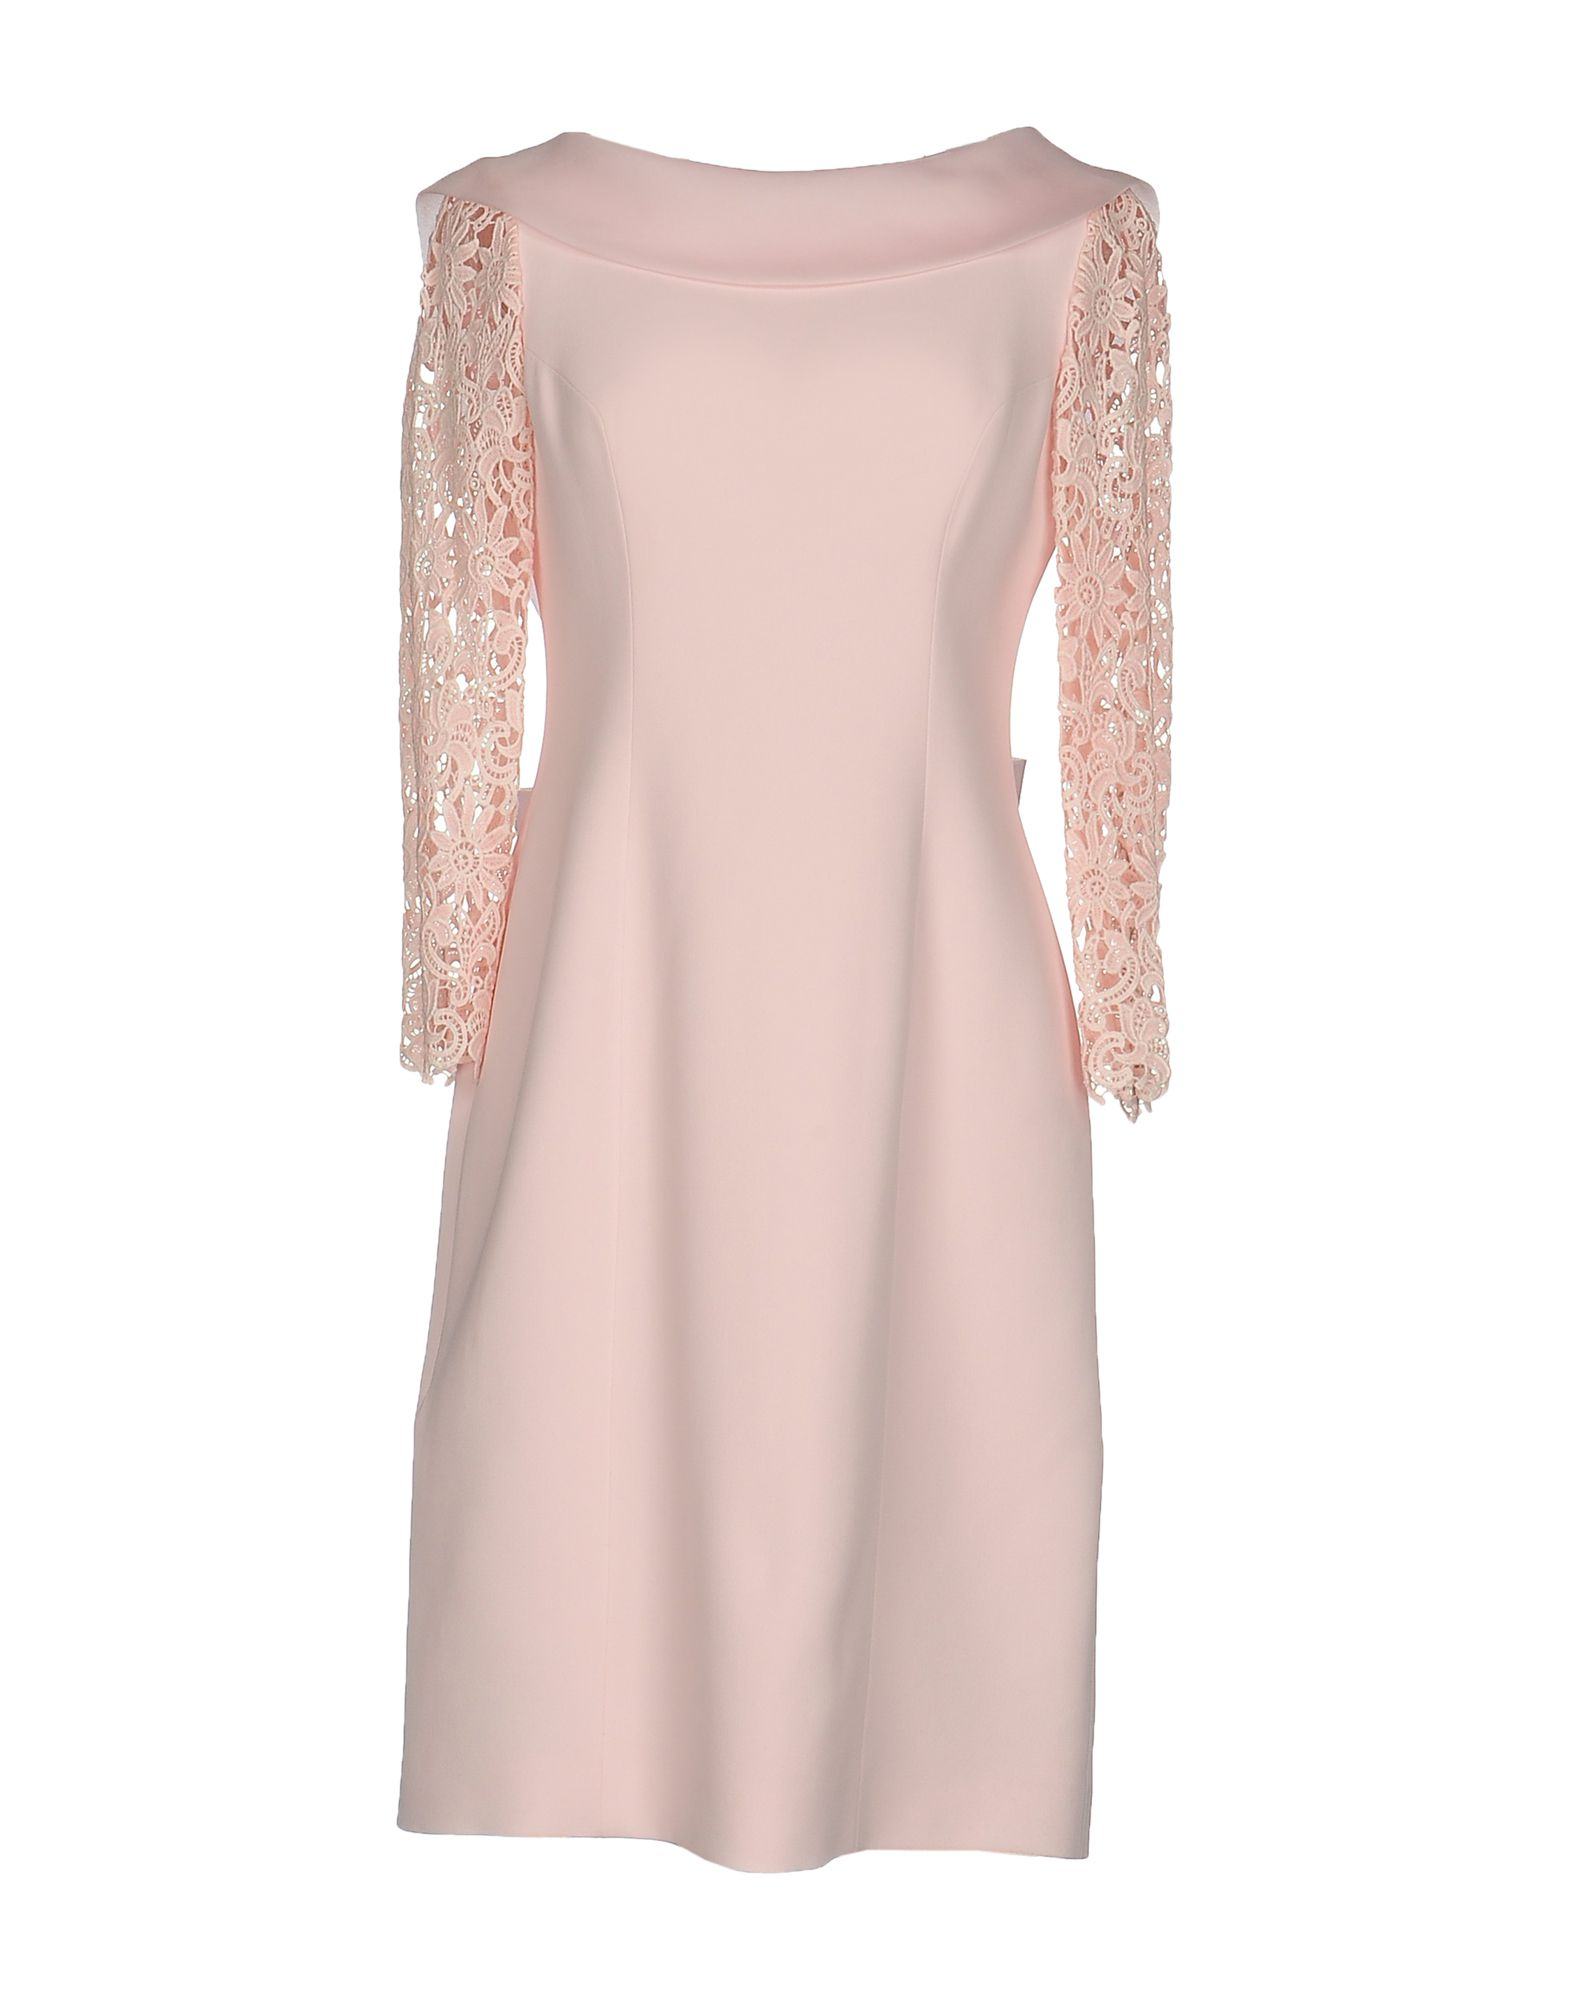 MUSANI GOLD Короткое платье musani gold длинное платье